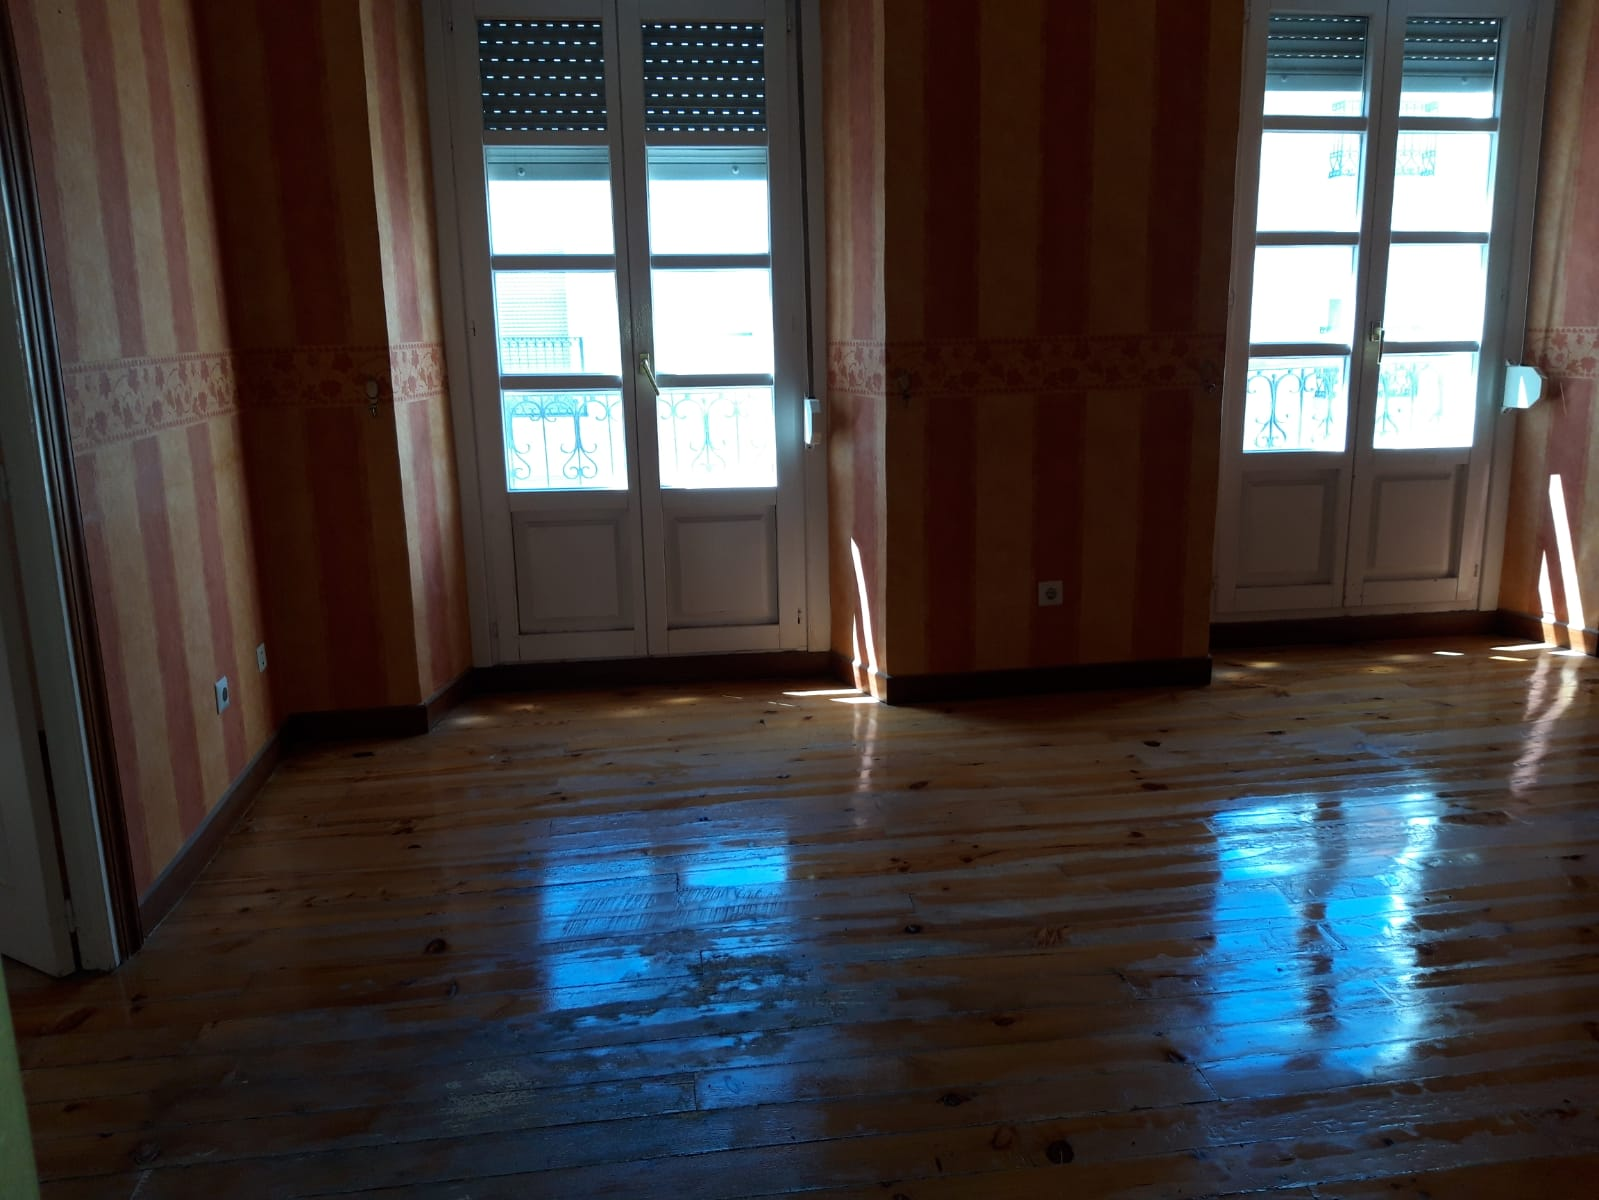 Piso en venta en Zabalgunea/ensanche, Vitoria-gasteiz, Álava, Calle Postas, 240.000 €, 3 habitaciones, 1 baño, 114,4 m2